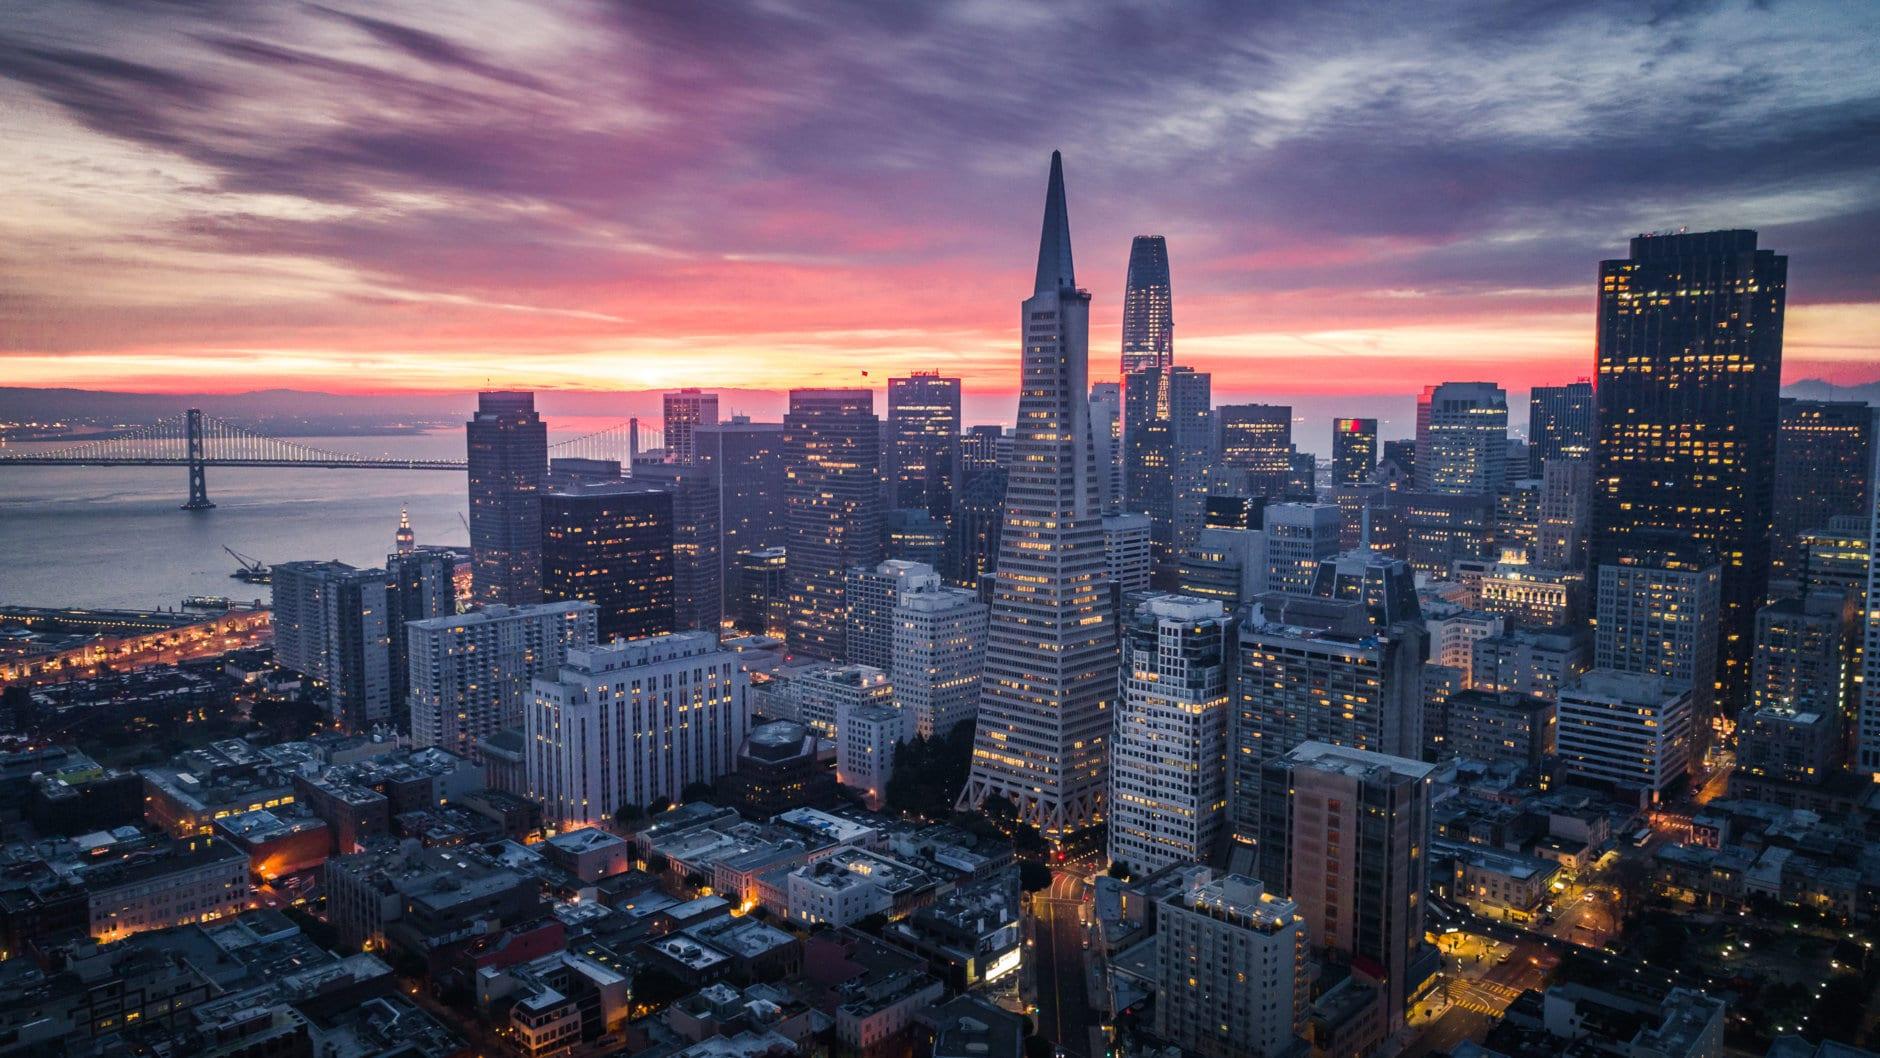 San Francisco Skyline with Dramatic Clouds at Sunrise, California, USA